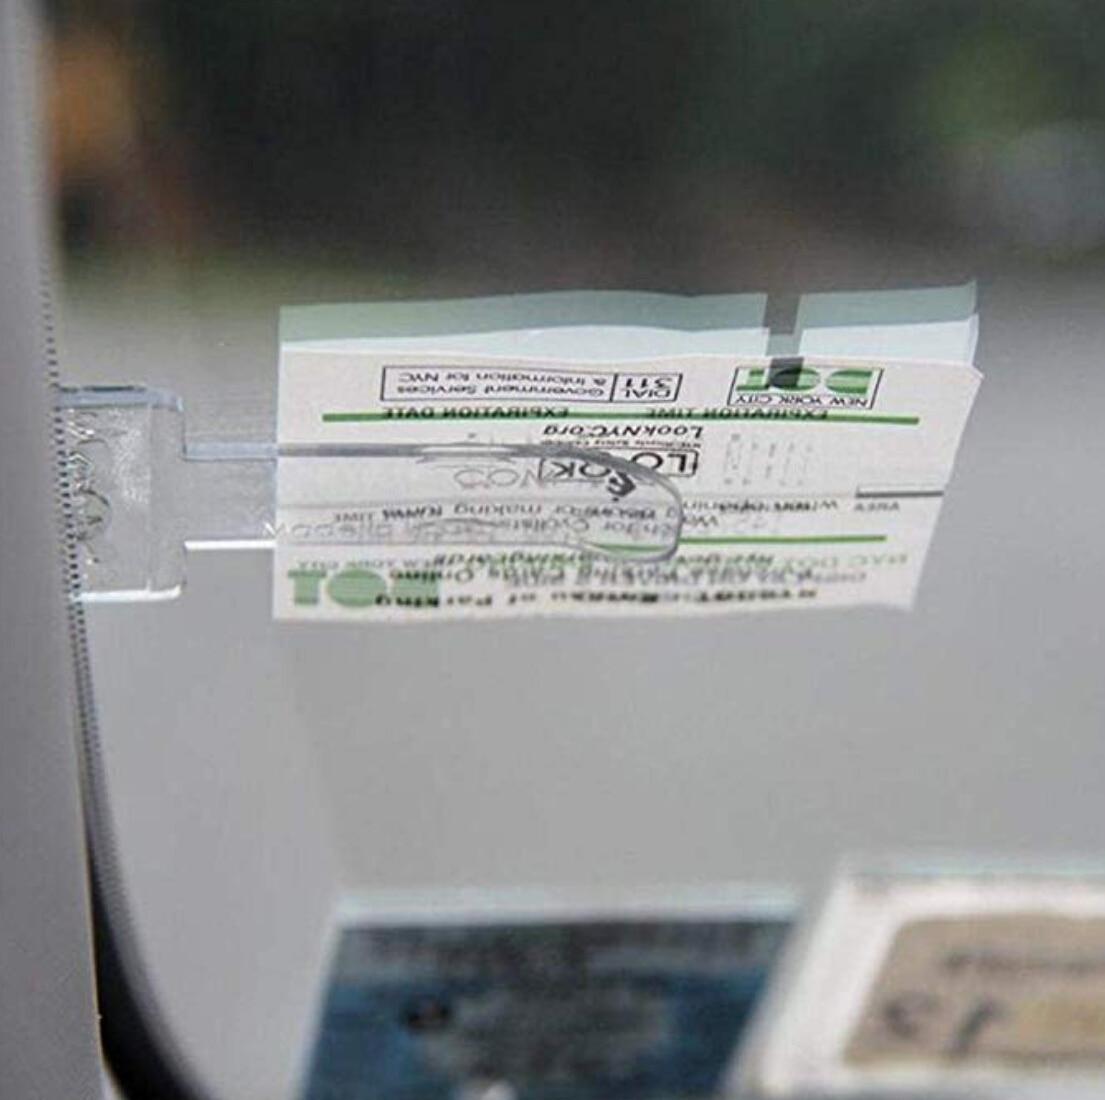 2019 Hot 4 Stuks Auto Accessoires Auto Ticket Map Voor Honda Cr Ford Focus 3 Audi A4 B6 Peugeot 3008 Vw Tucson 2017 Tucson